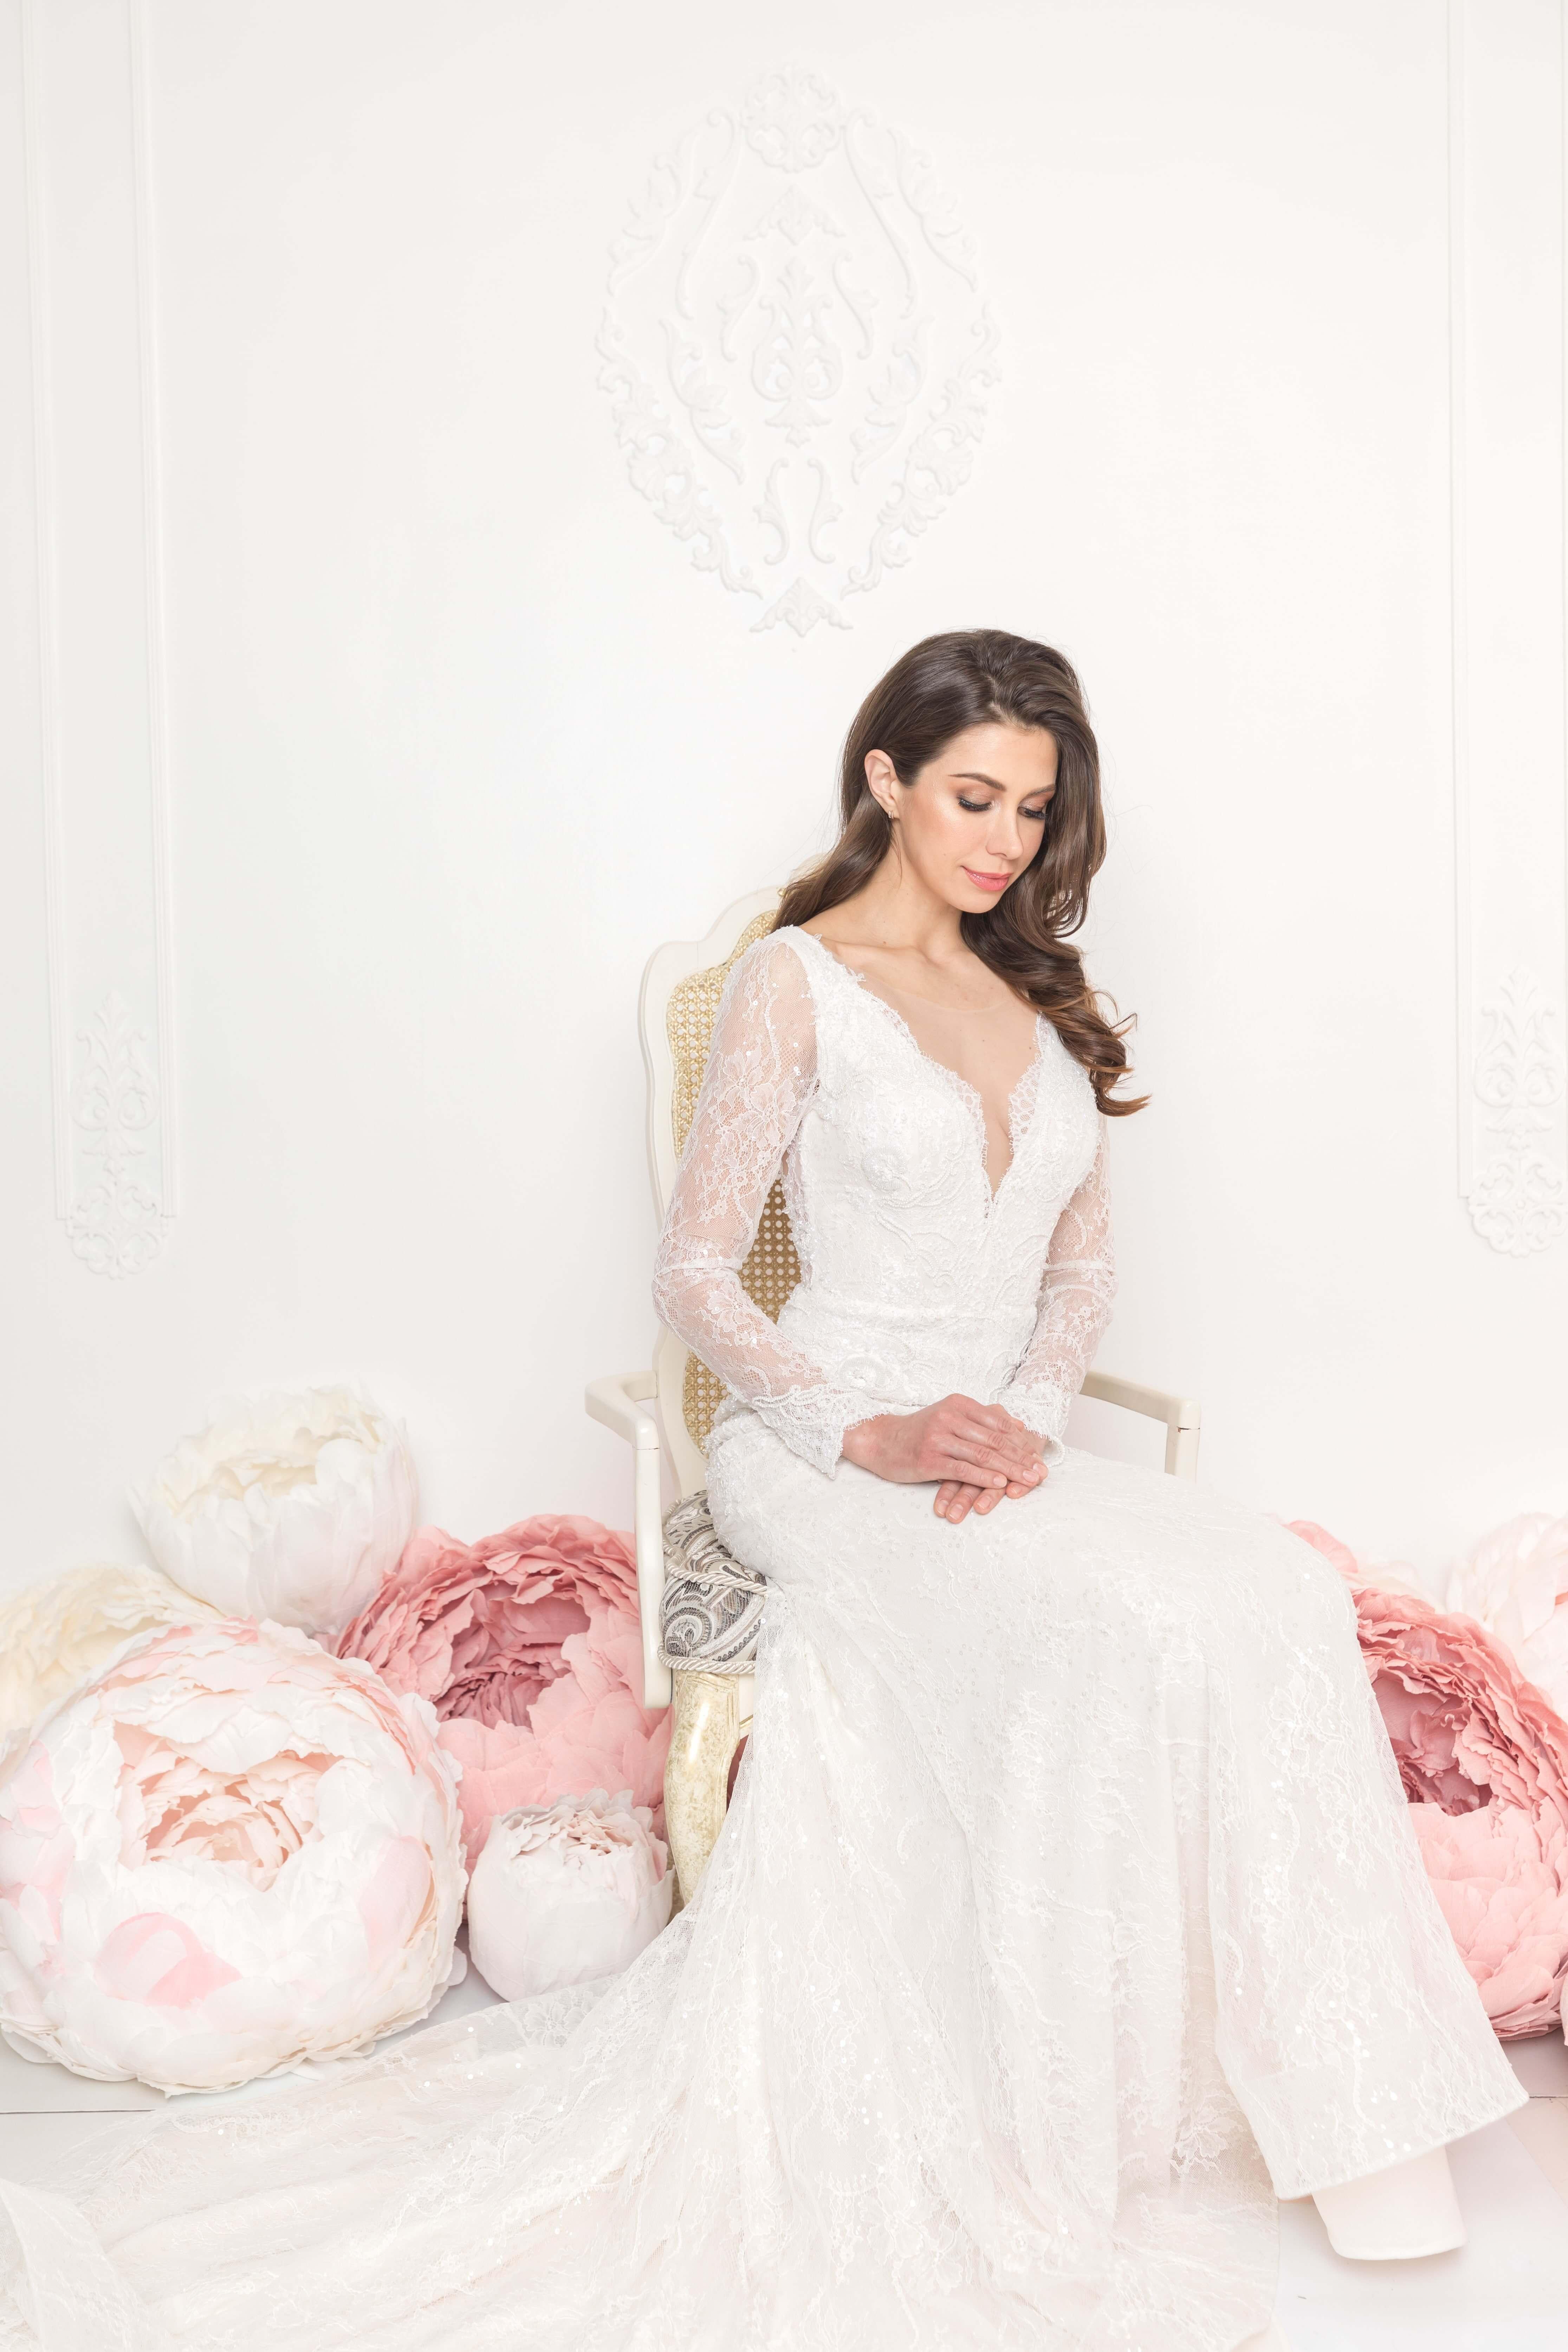 robe de mariee dentelle de chantilly lilia haute couture montreal boutique robes de noces